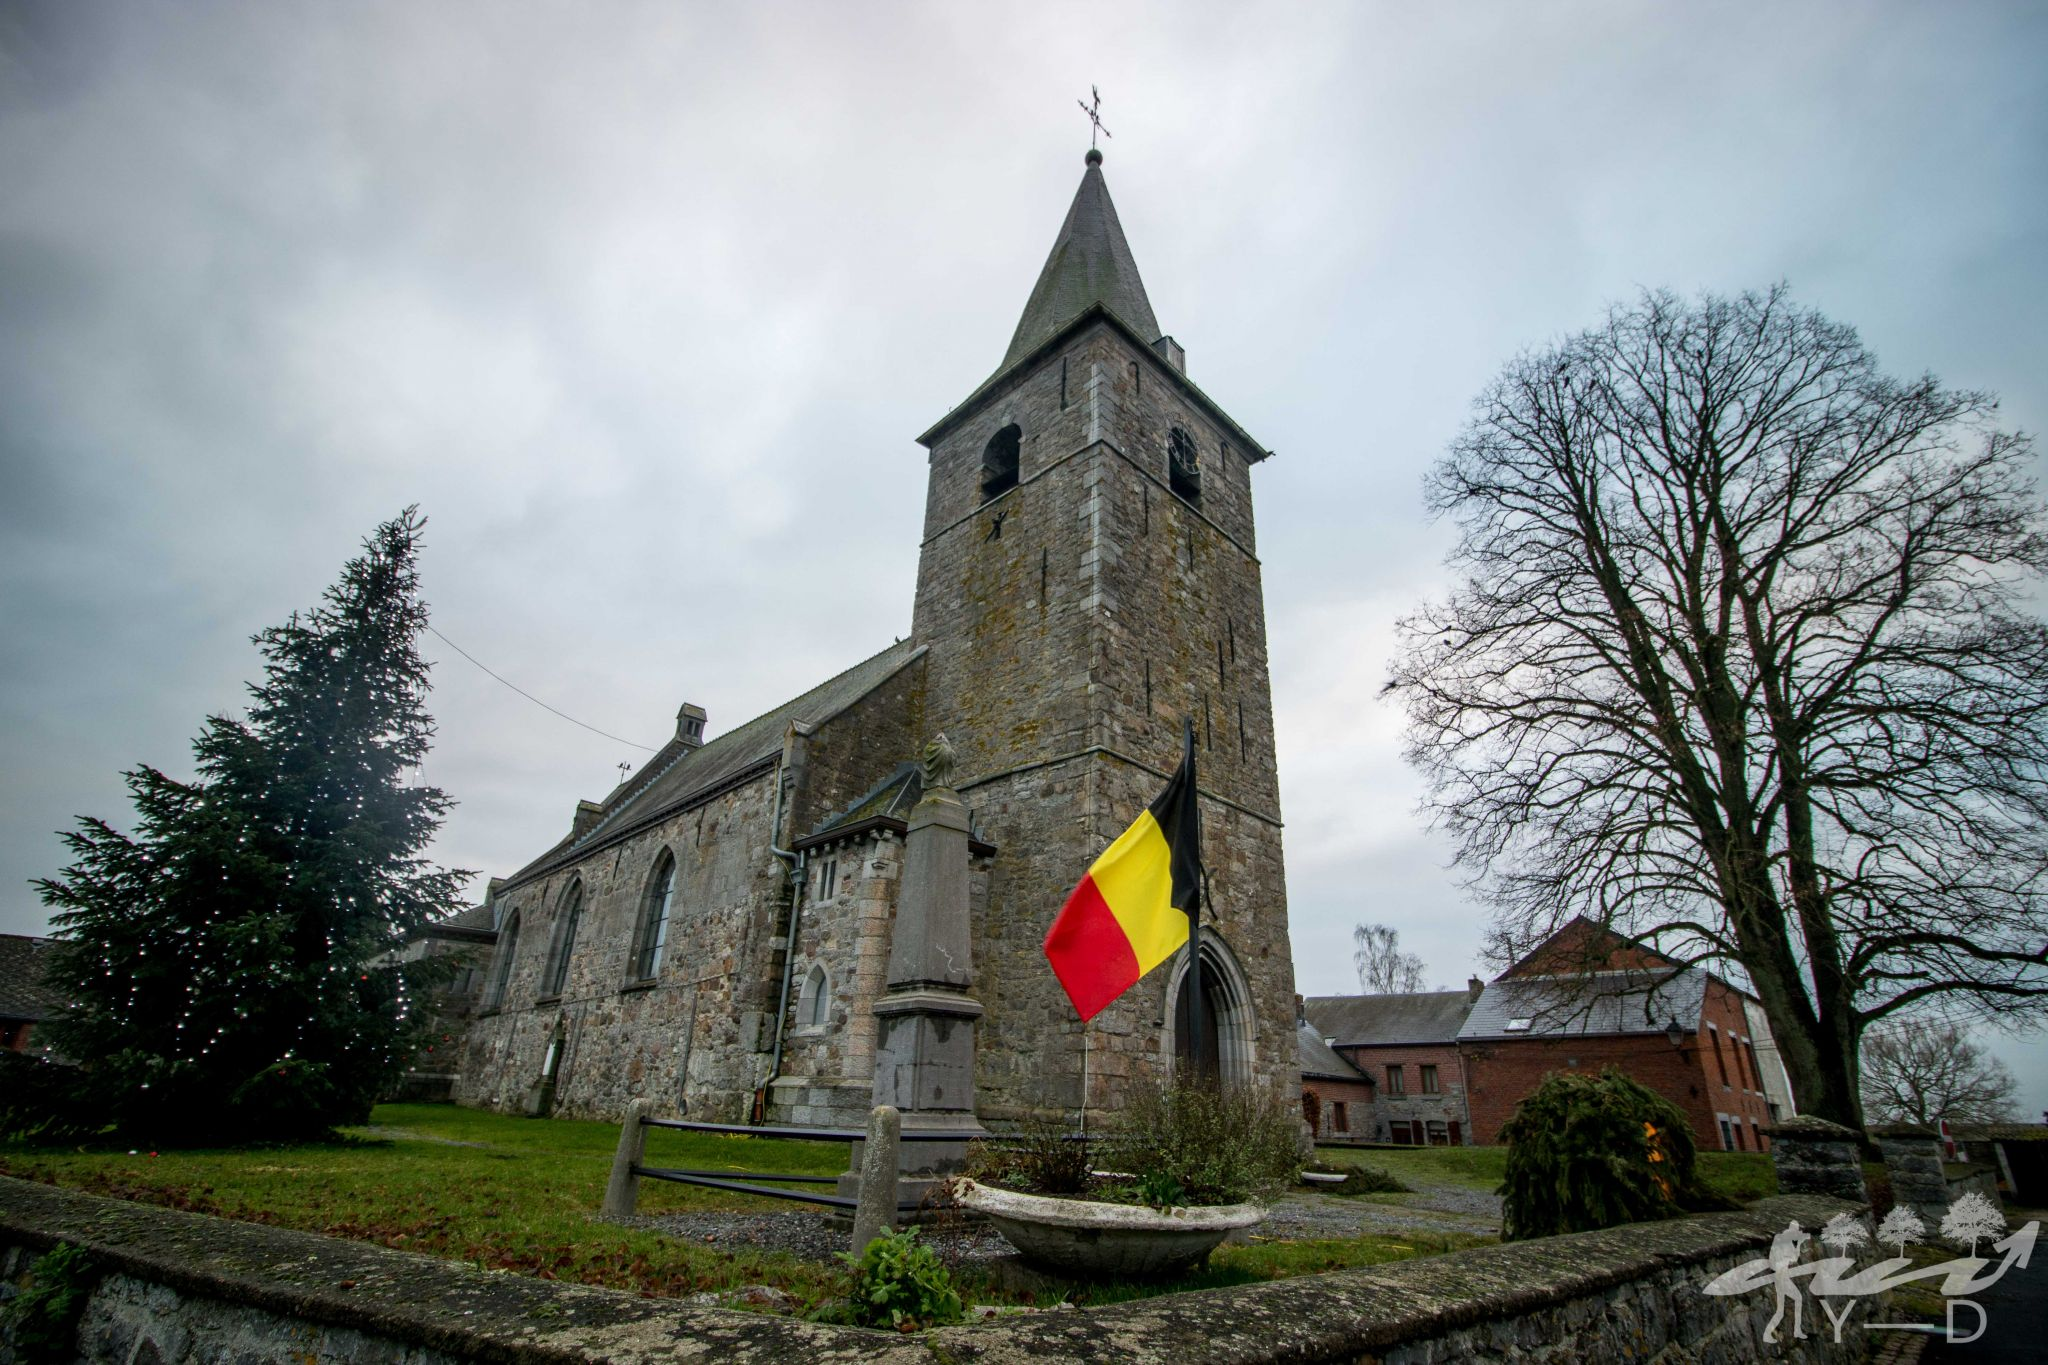 Ragnies, Belgium